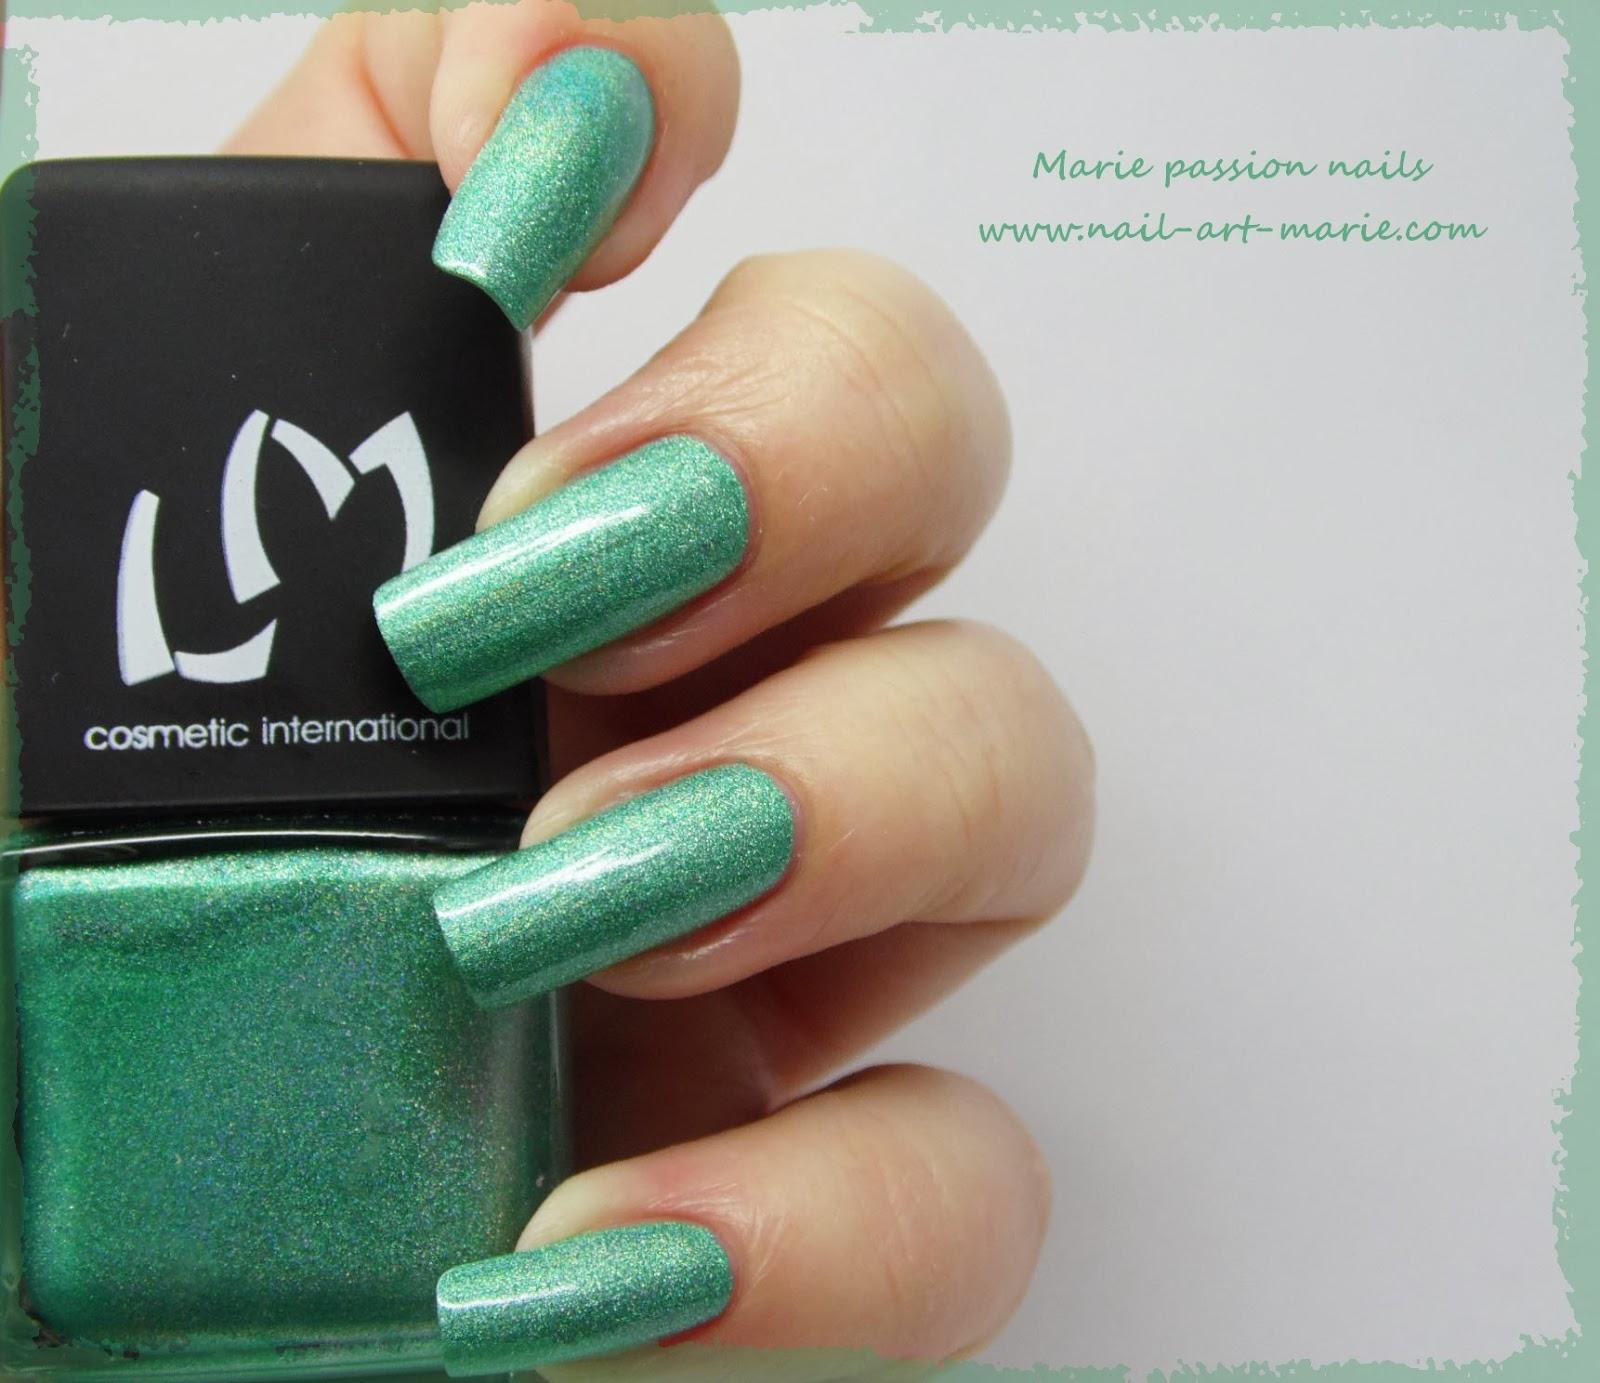 LM Cosmetic Syrma3